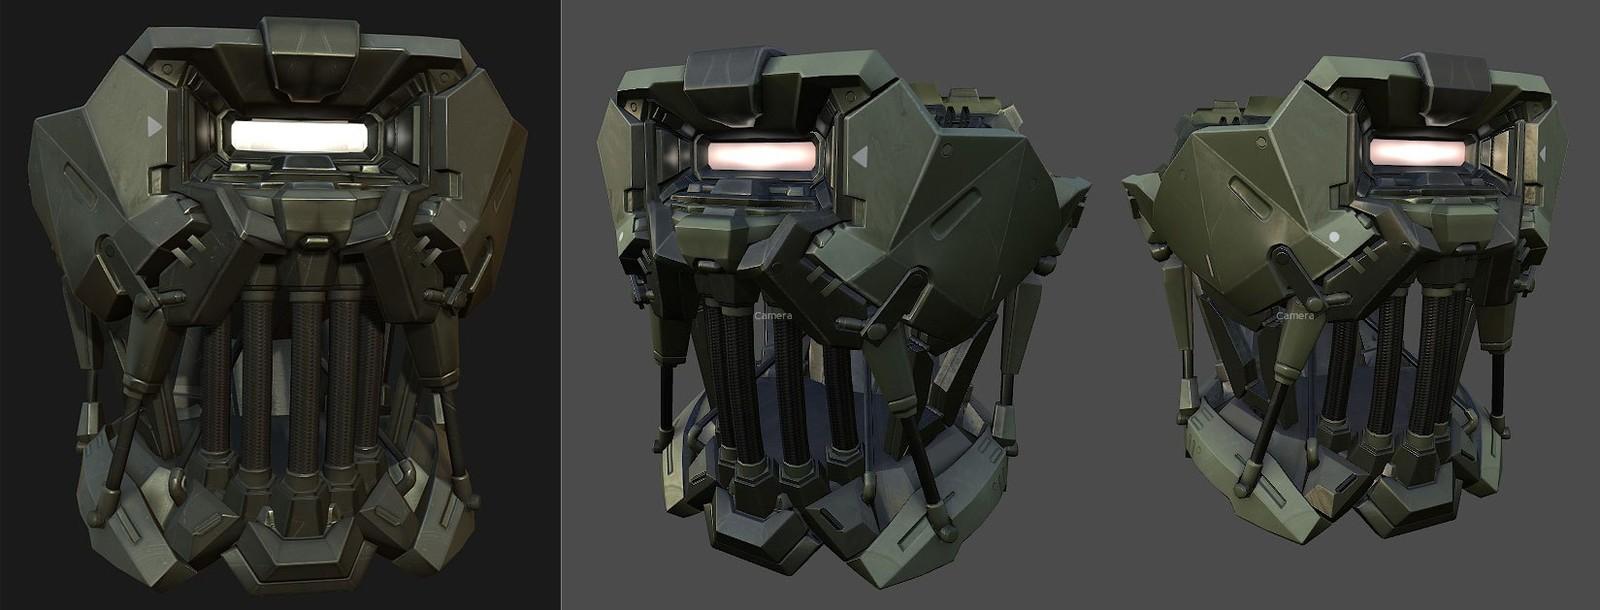 I modeled and textured the armorset based on a design by Scott Kikuta.